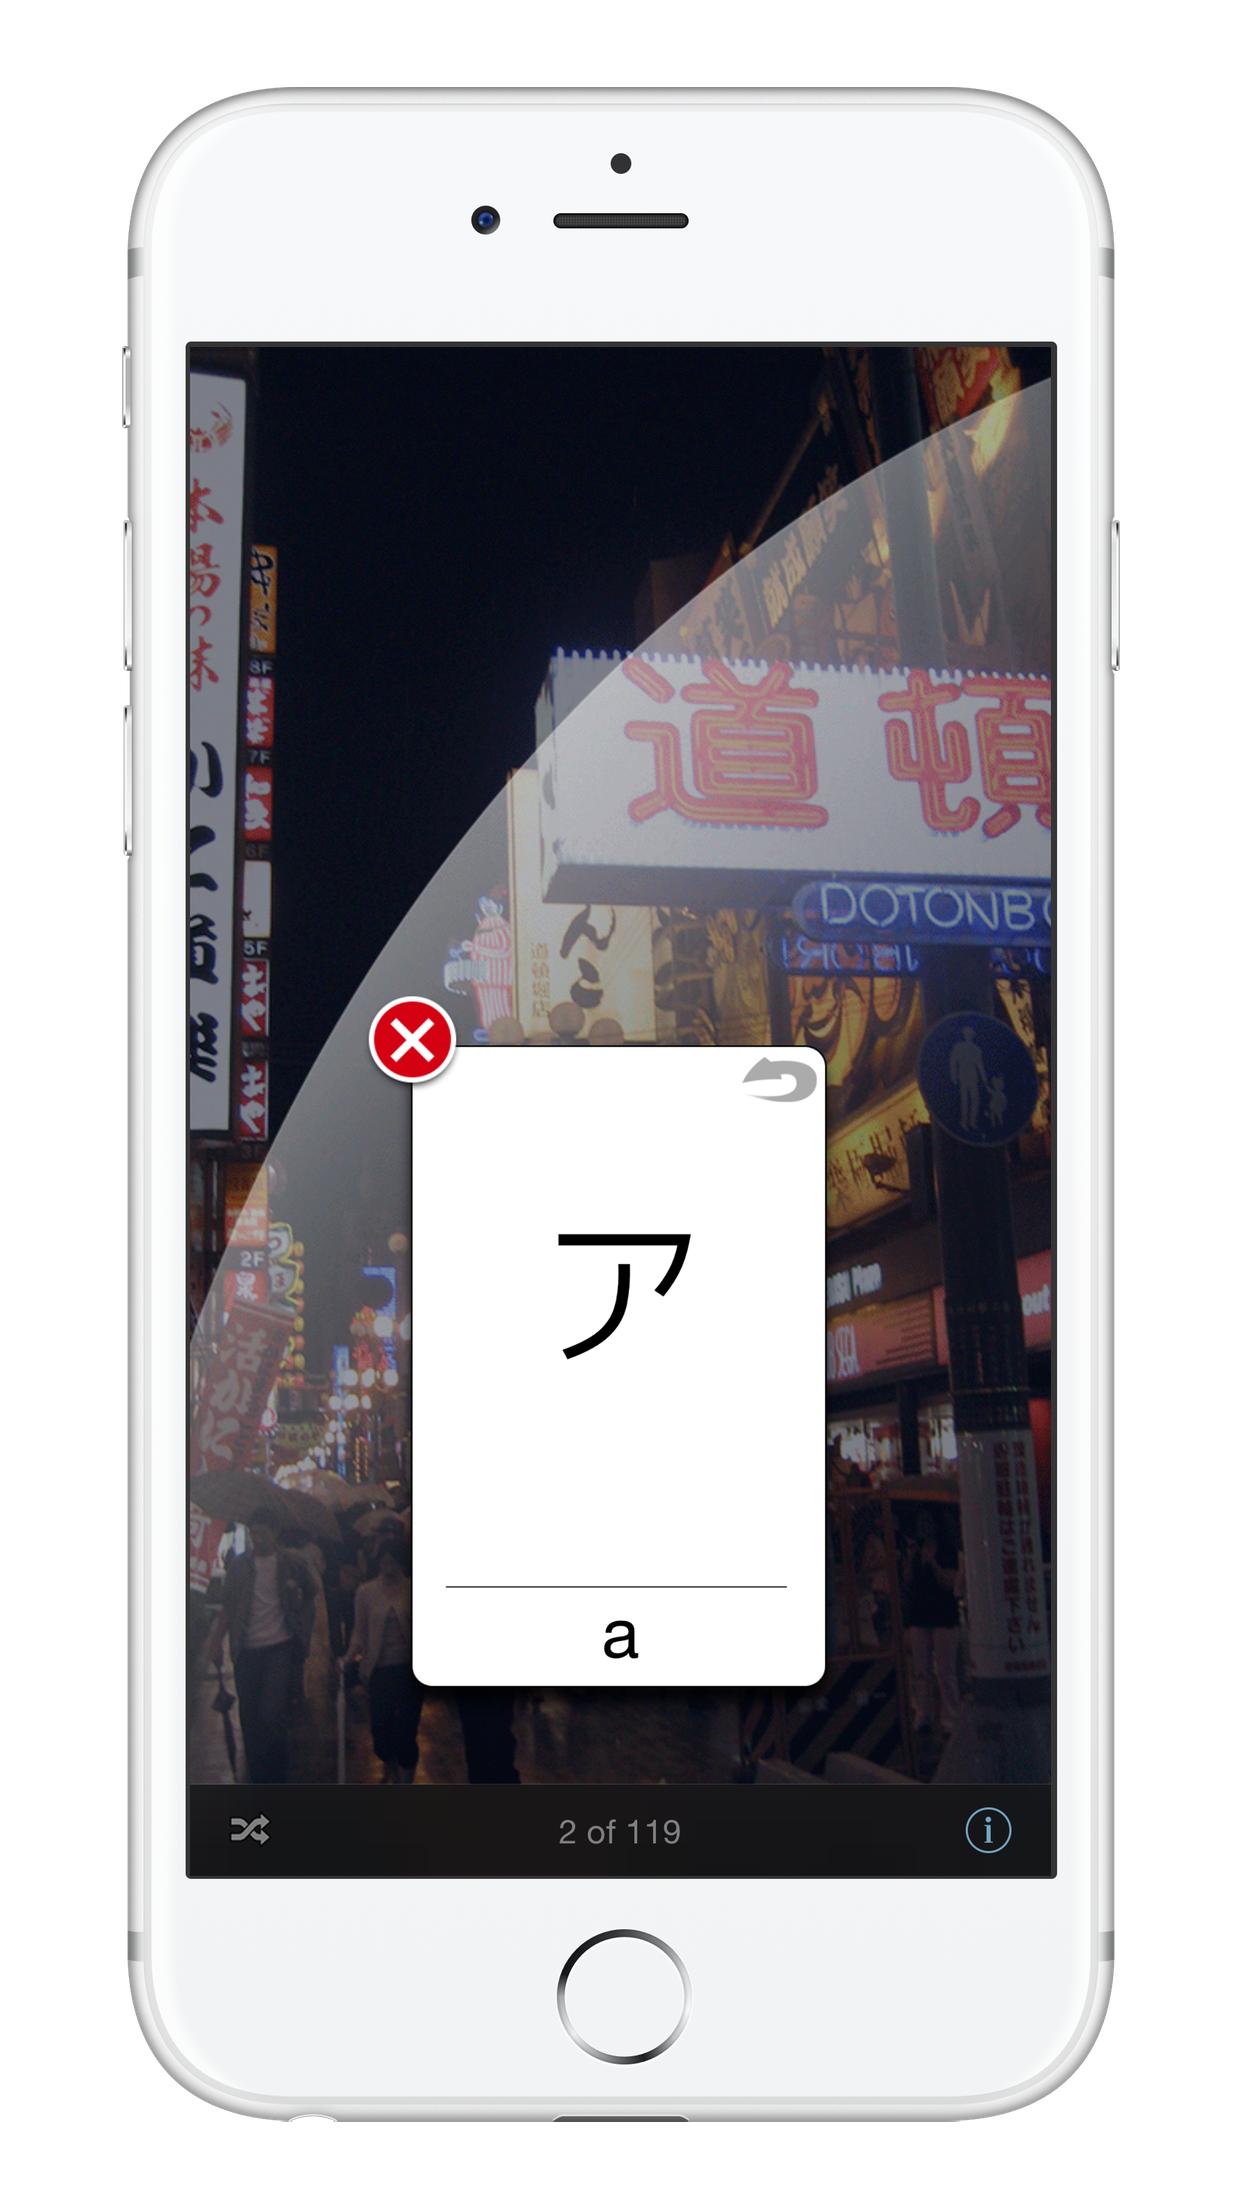 Katakana screenshot 3.png